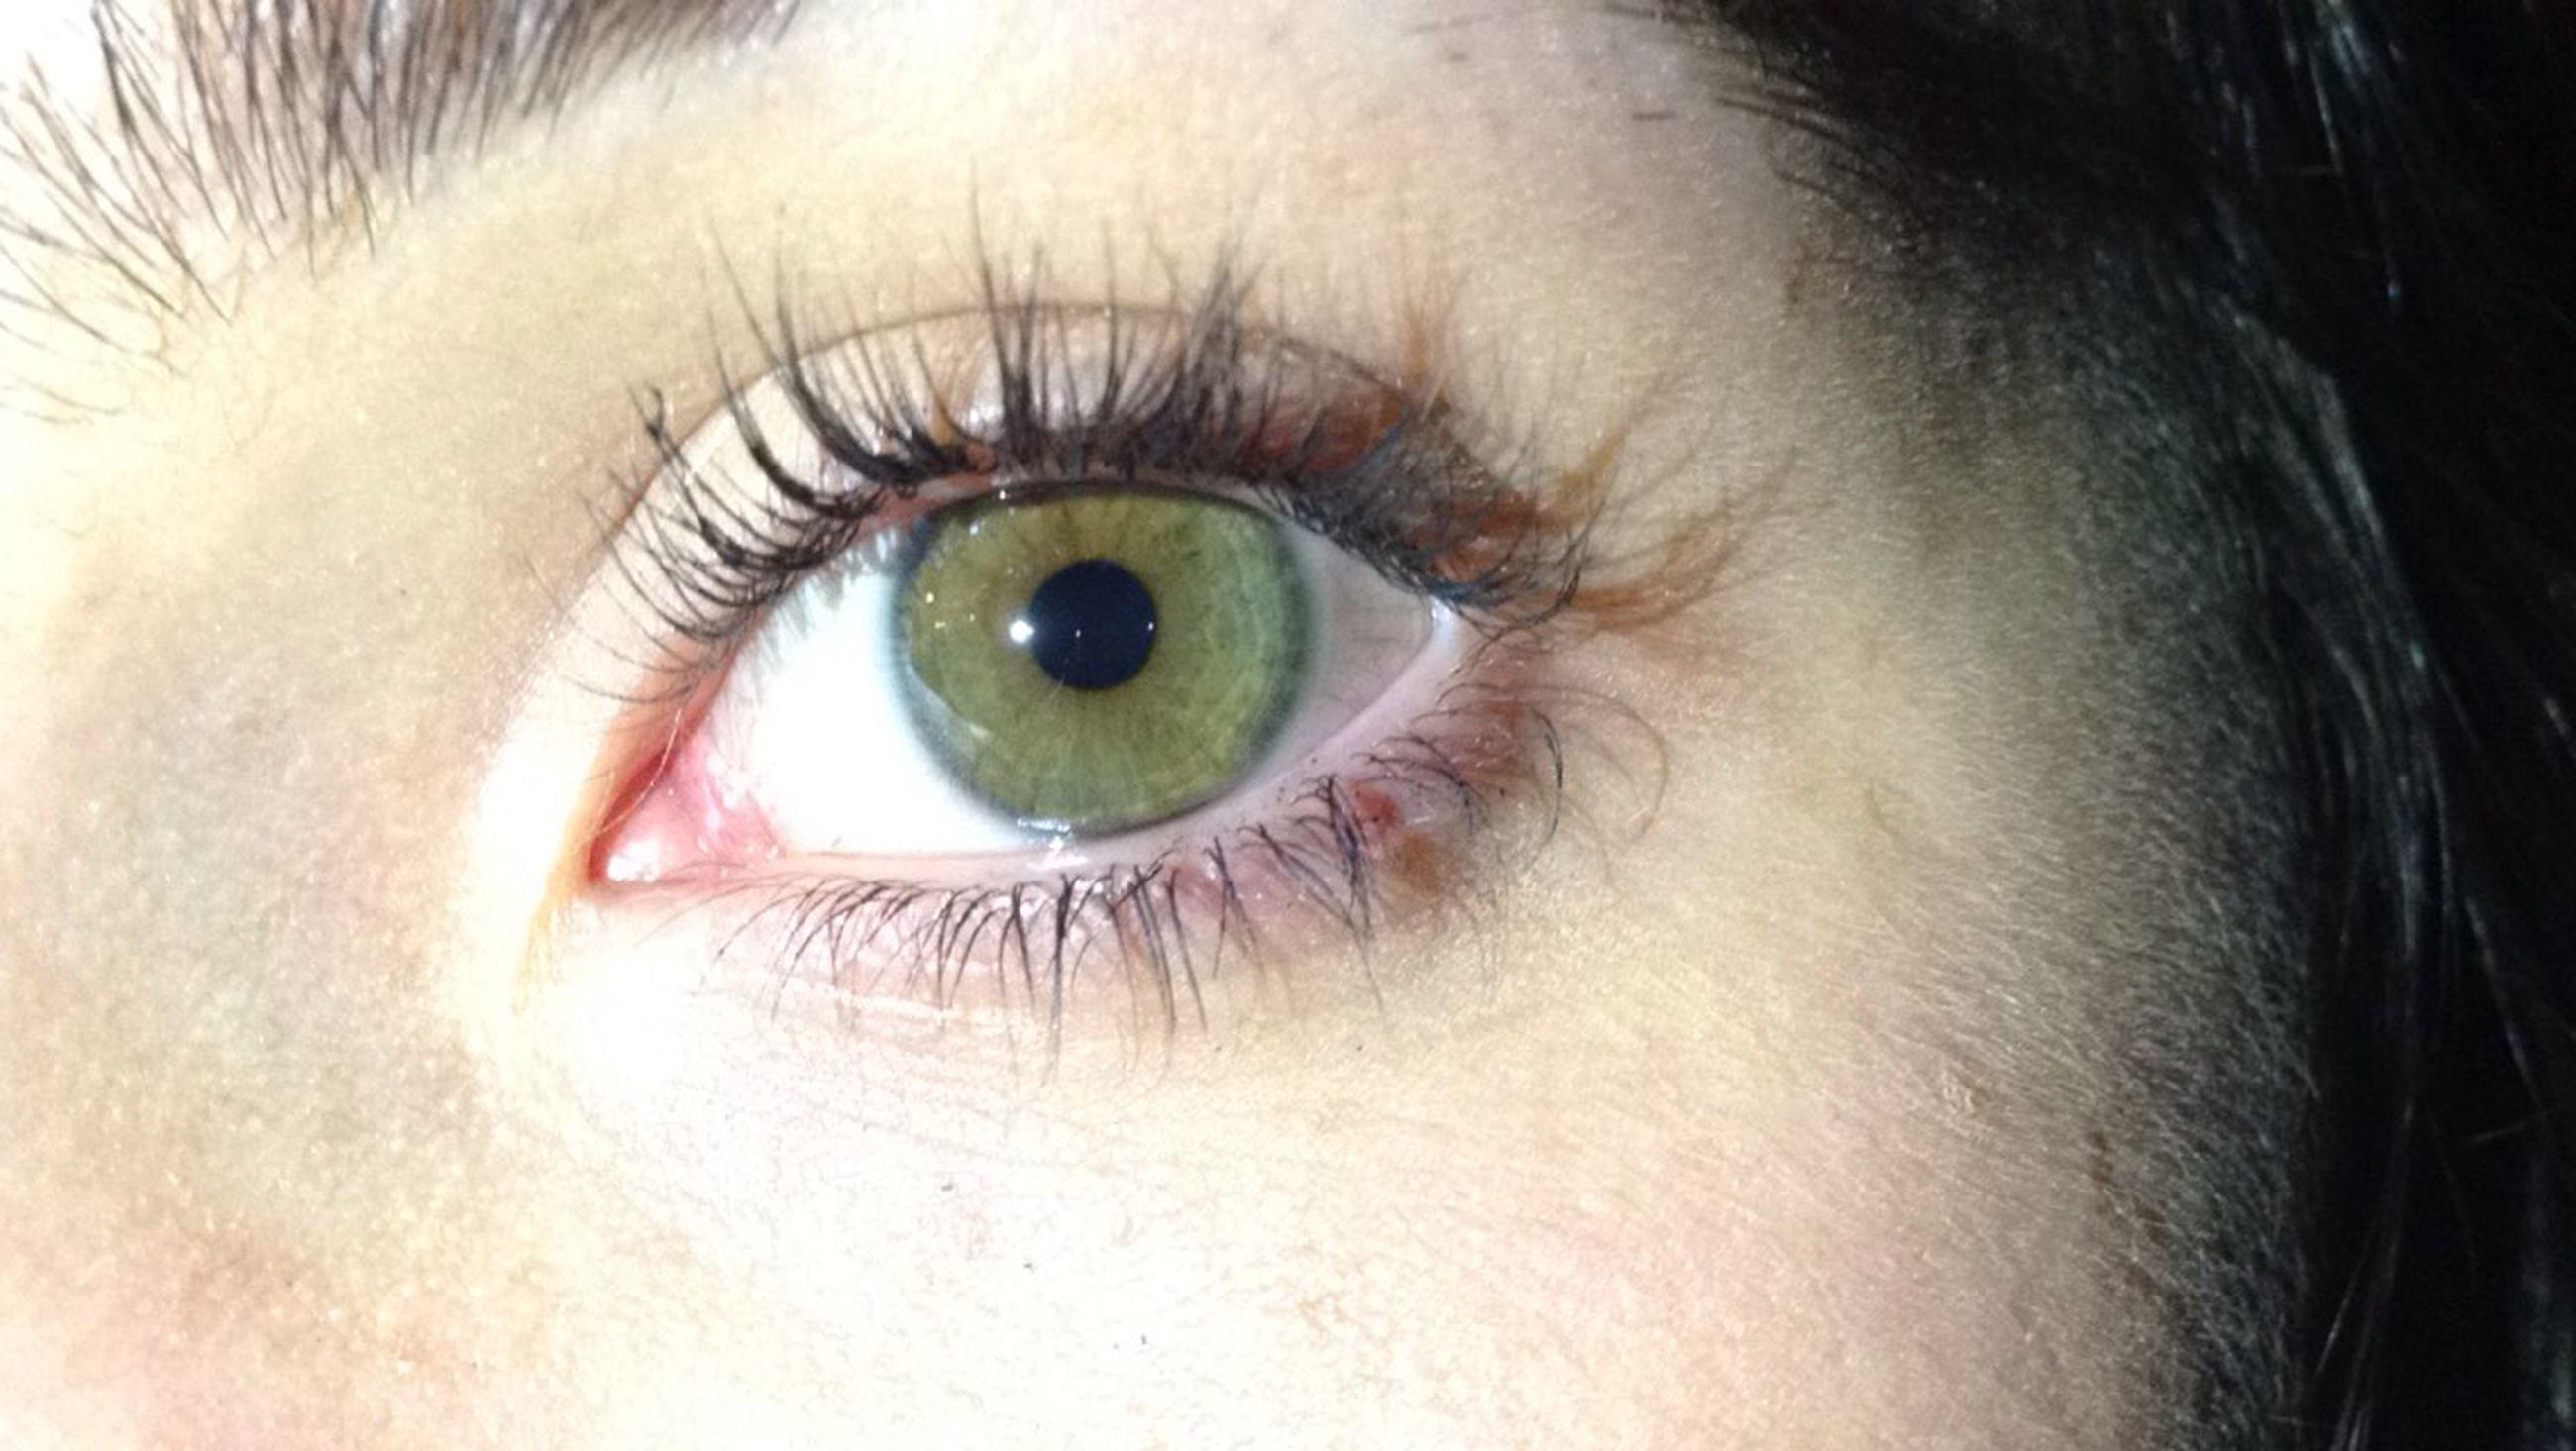 human eye, eyelash, close-up, eyesight, part of, sensory perception, extreme close-up, human skin, extreme close up, iris - eye, full frame, eyeball, unrecognizable person, human face, person, looking at camera, vision